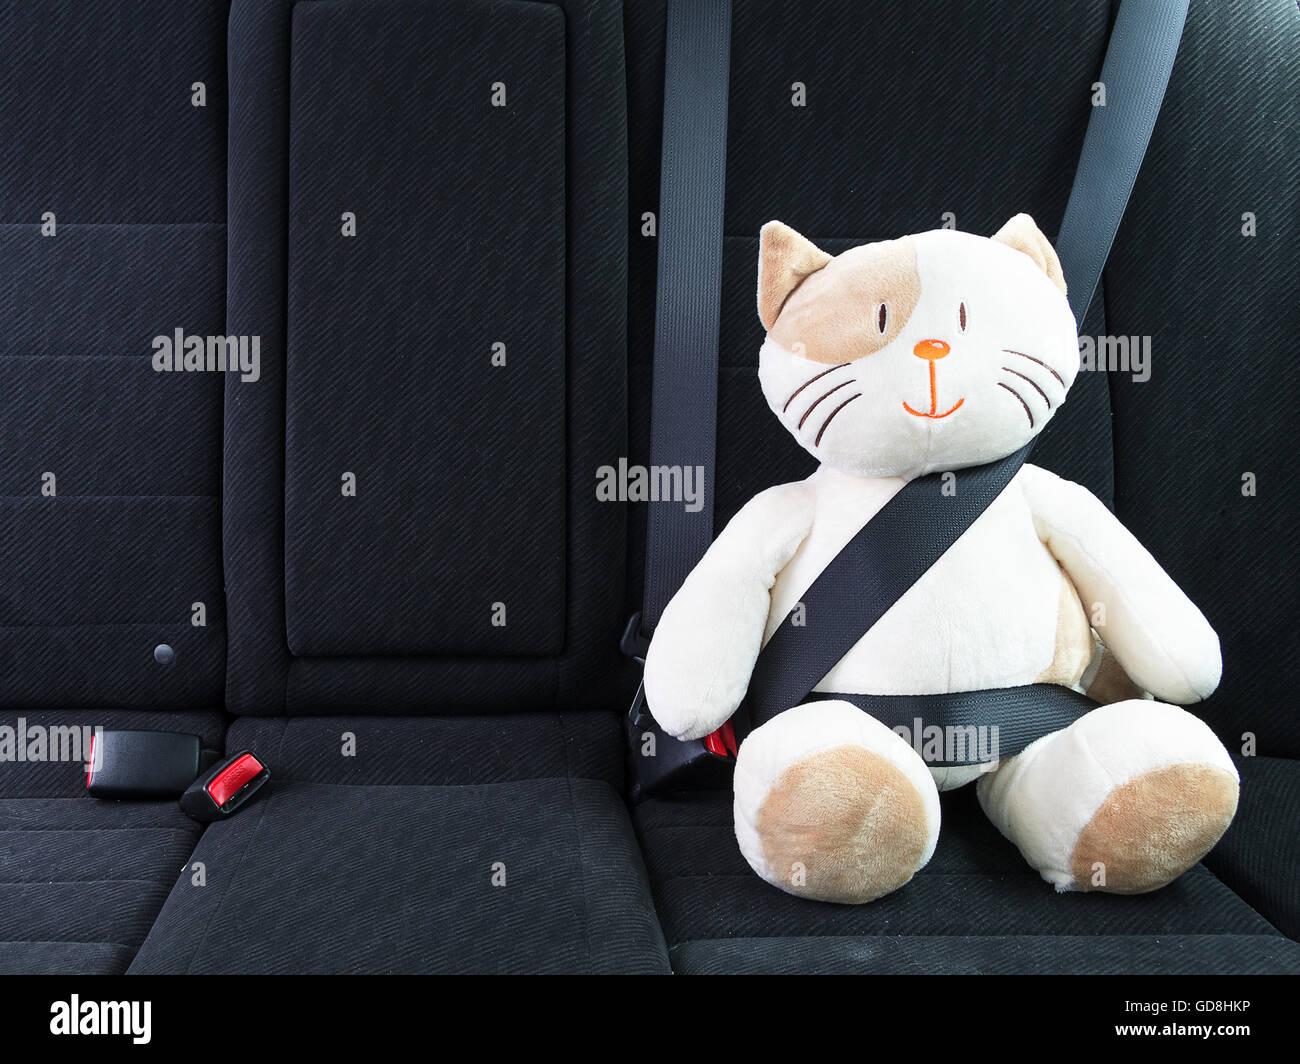 Stuffed Toy With Seat Belt Fastened Stock Photo 111442234 Alamy